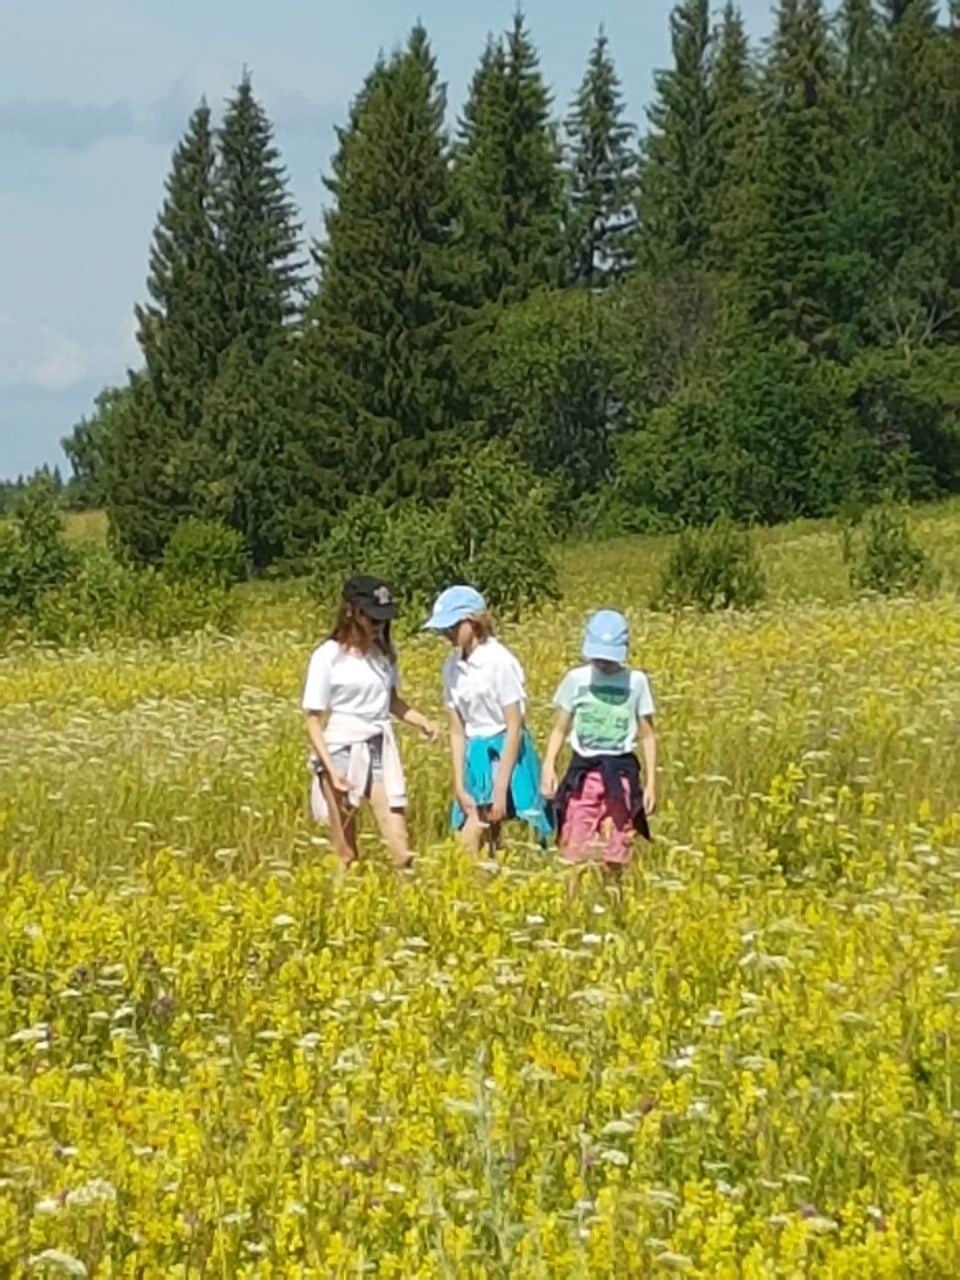 Trans-Siberian Railway trip experience. Summer field.